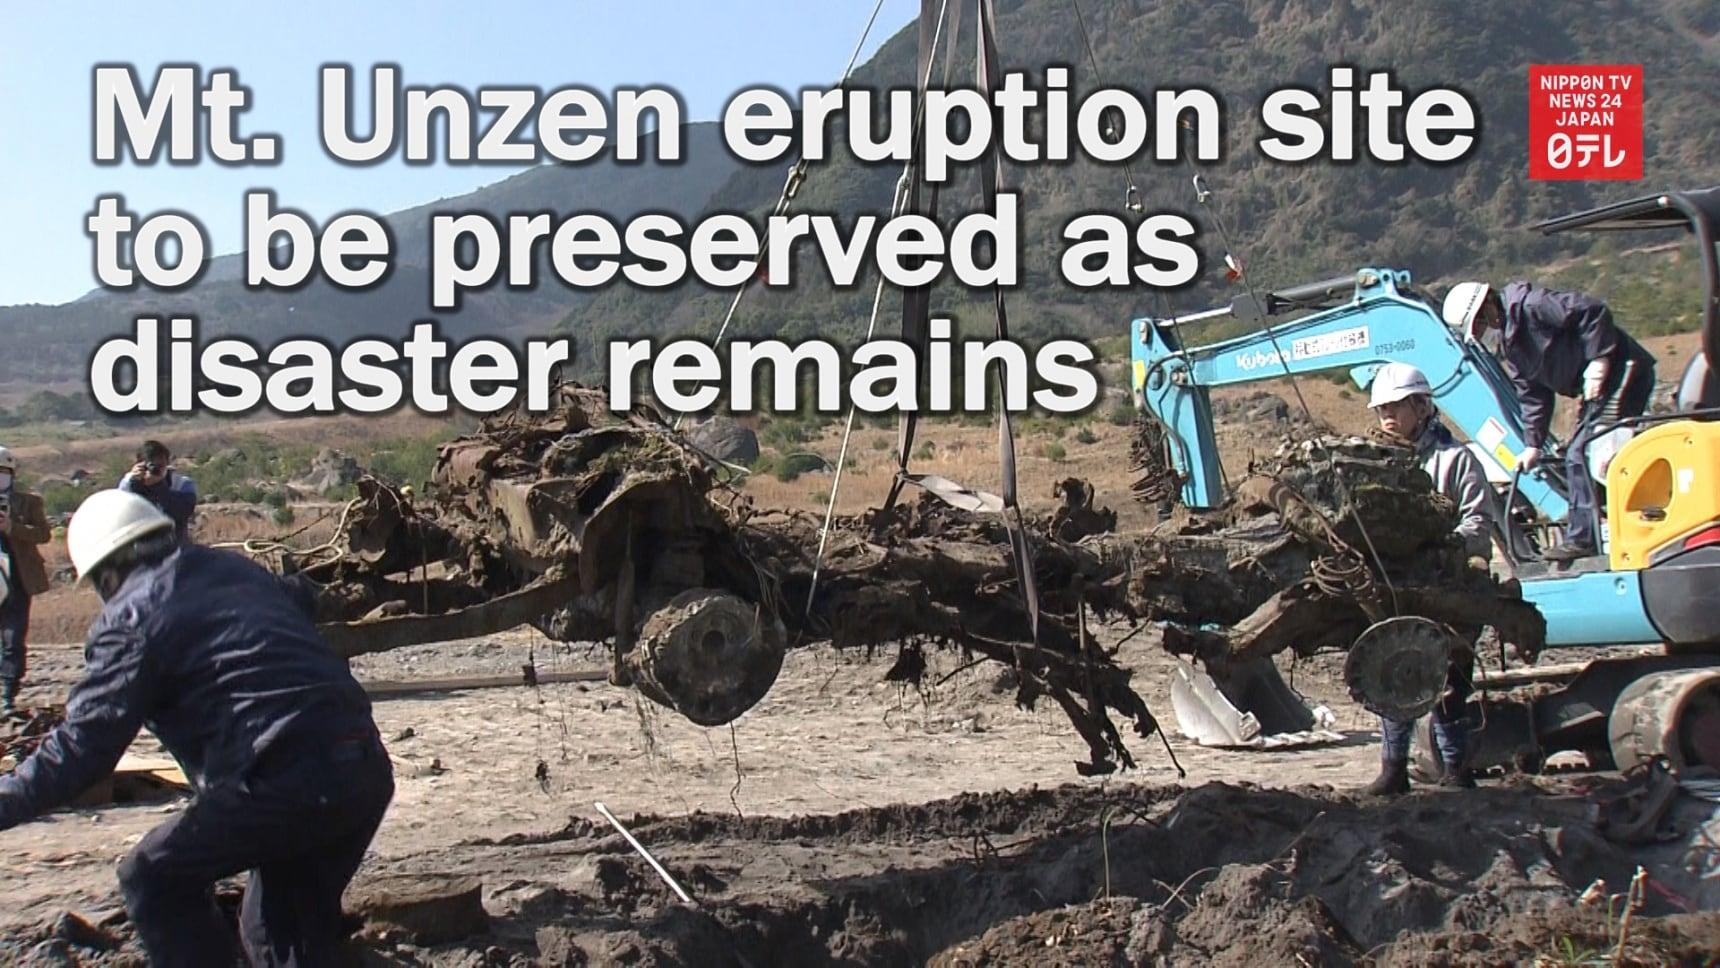 Mount Unzen Eruption Site to be Preserved